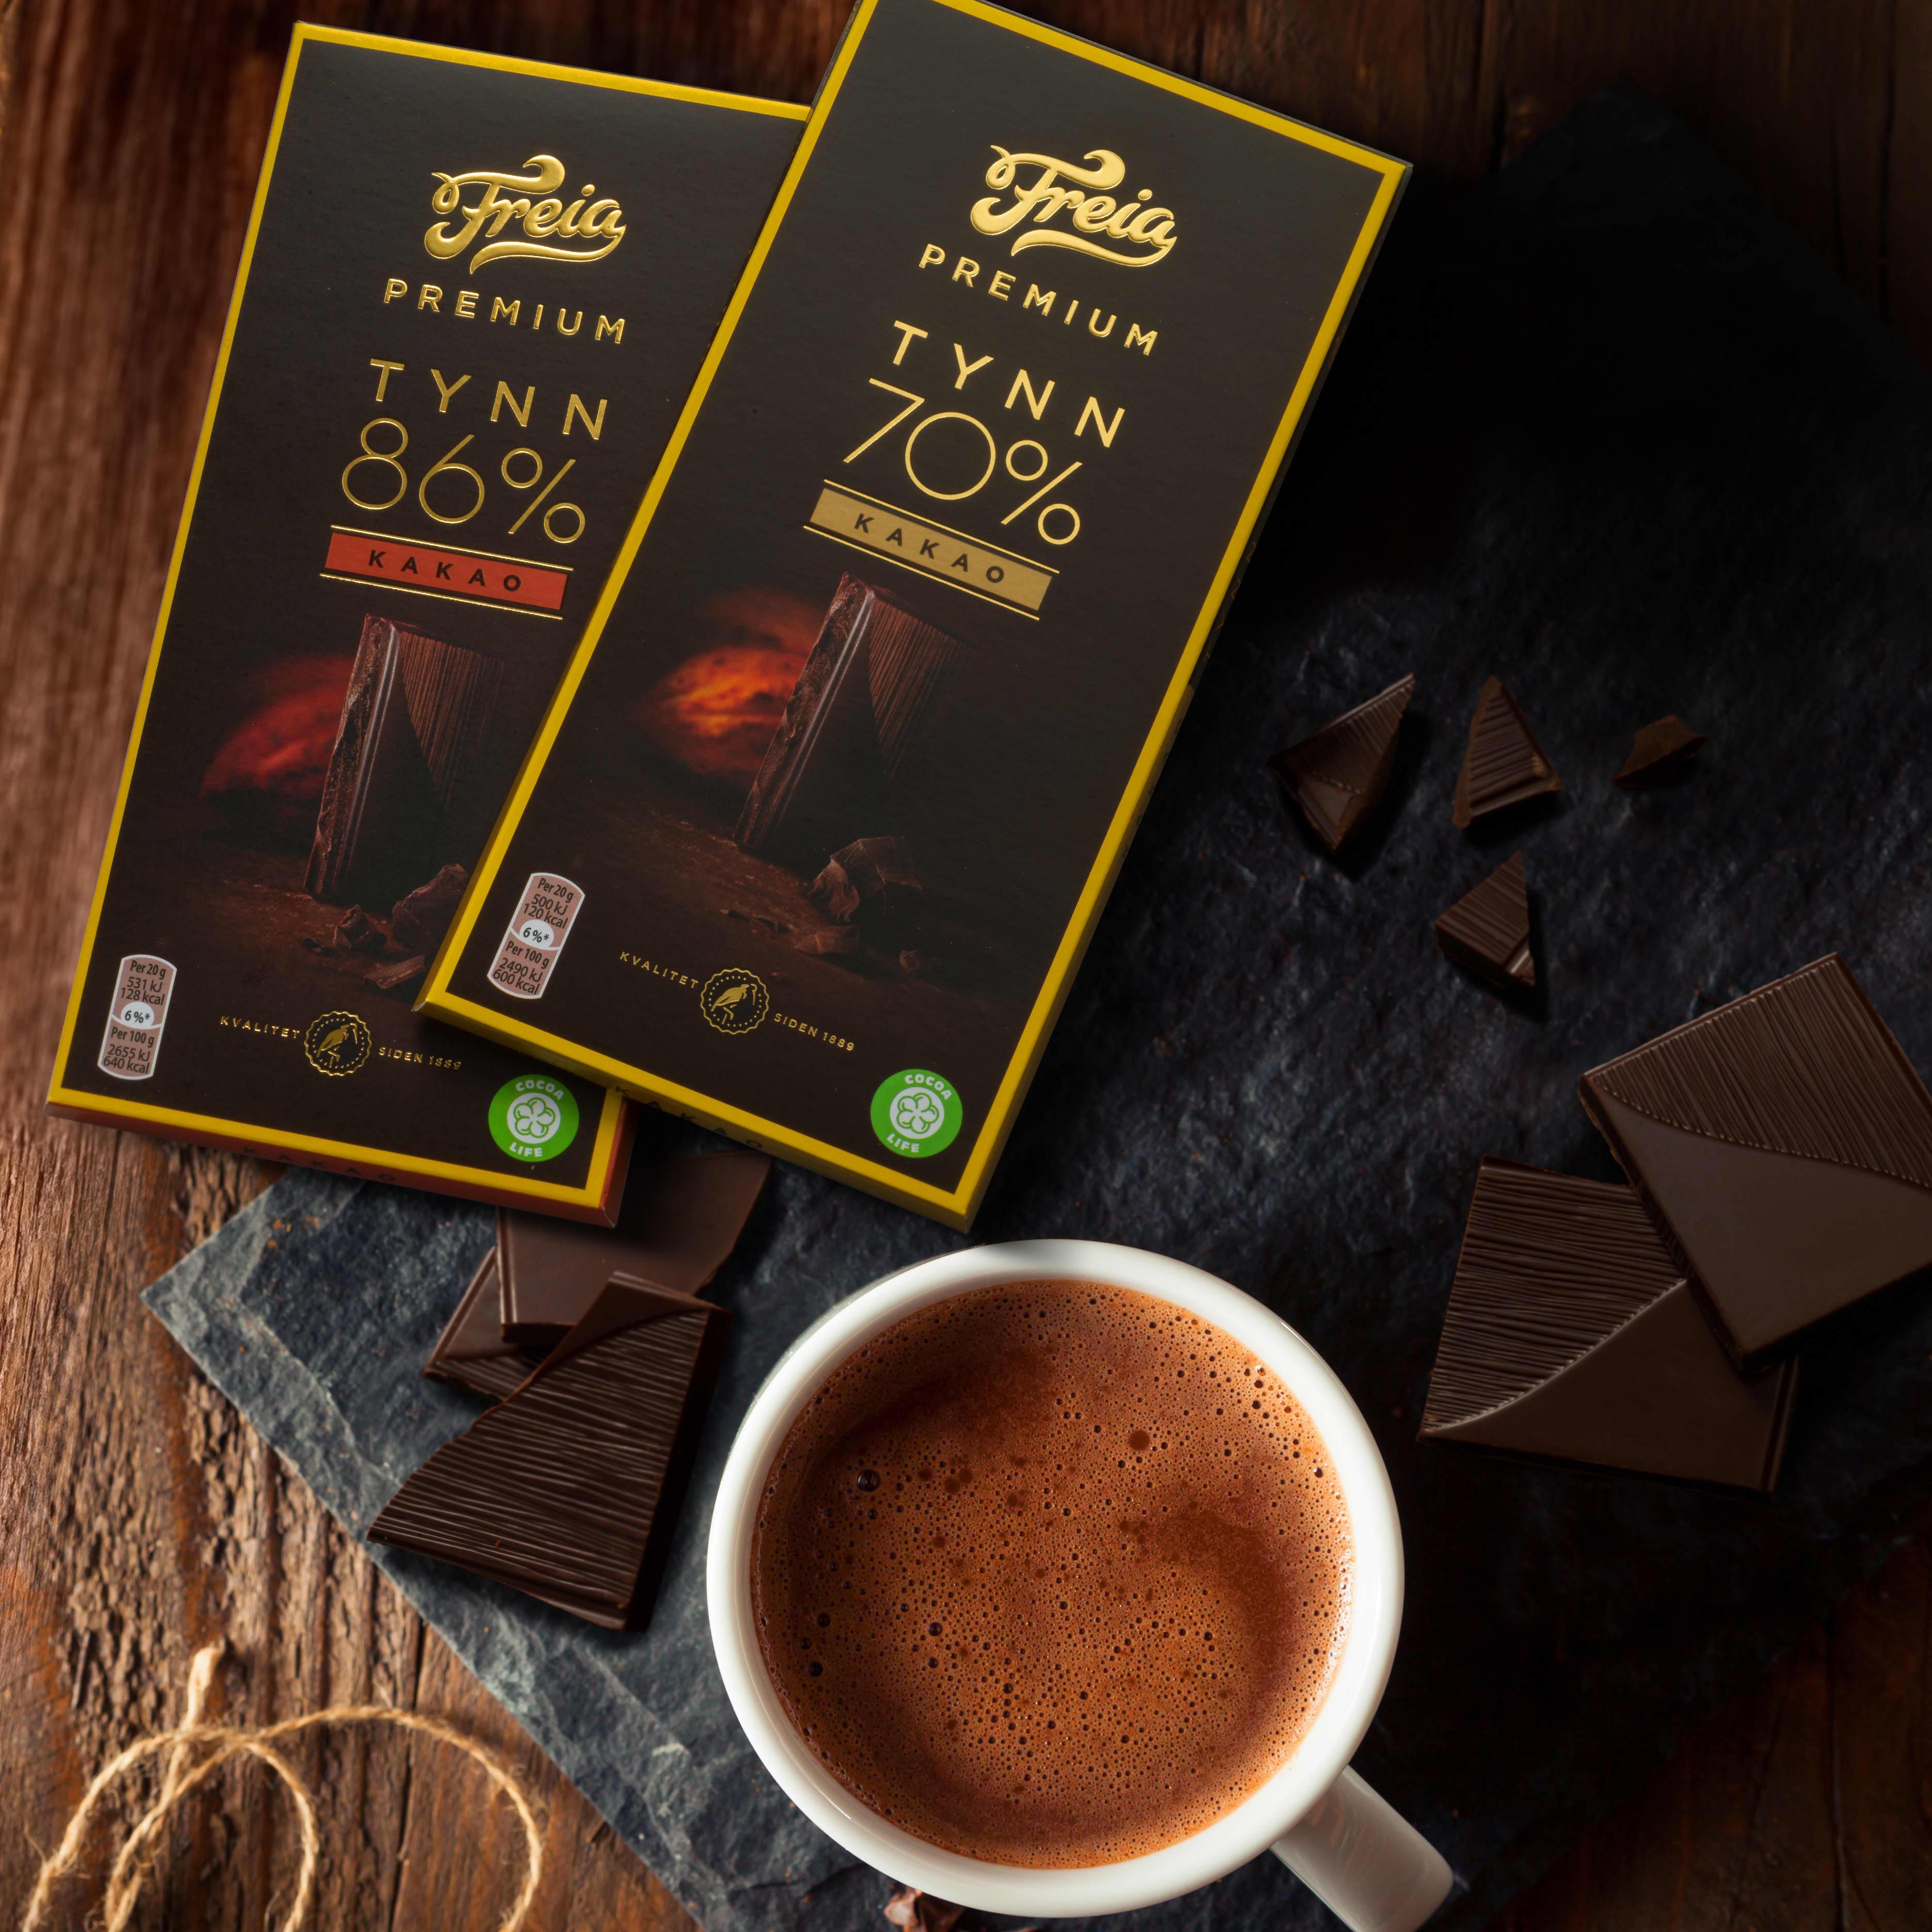 Freia Premium Mørk sjokolade